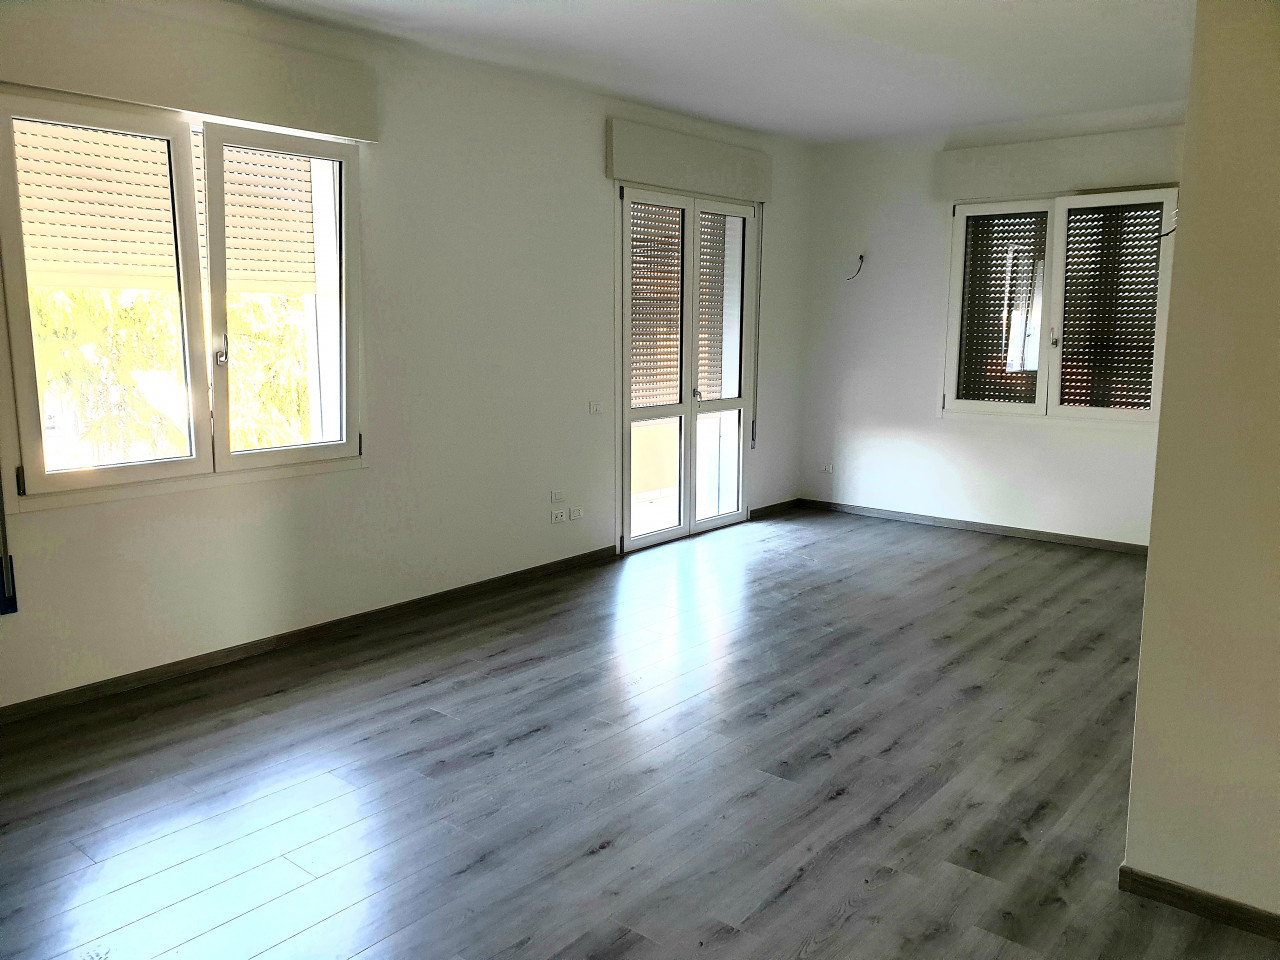 Appartamento in vendita a Cologna Veneta